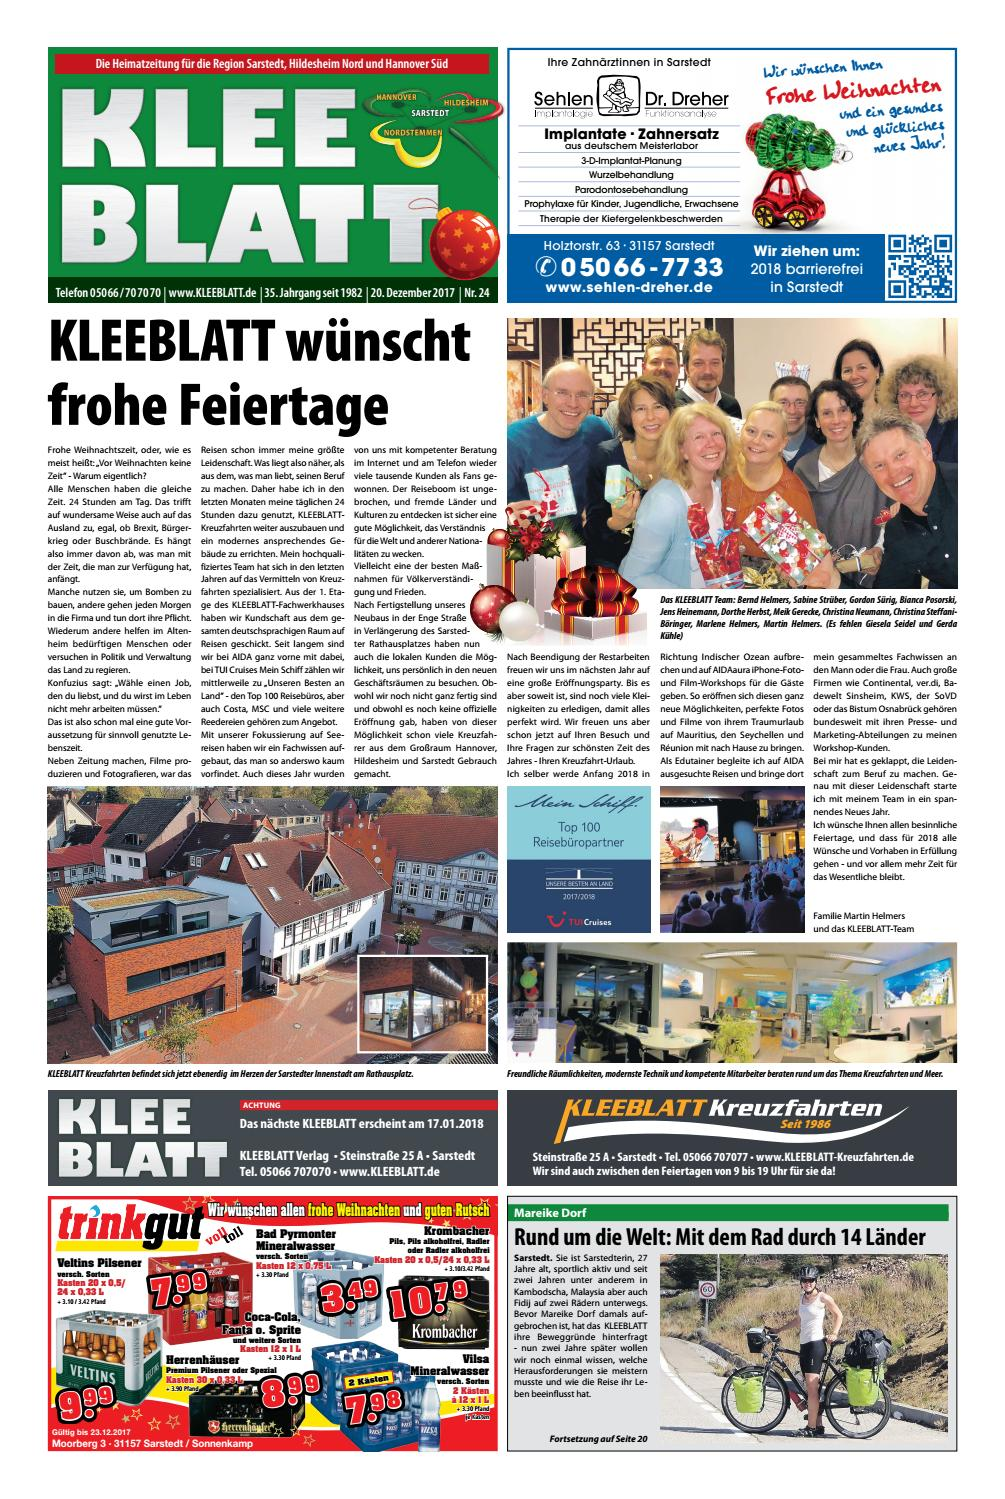 Lustige Weihnachtslieder Umgetextet.Kleeblatt 20 12 17 By Kleeblatt Verlag Issuu